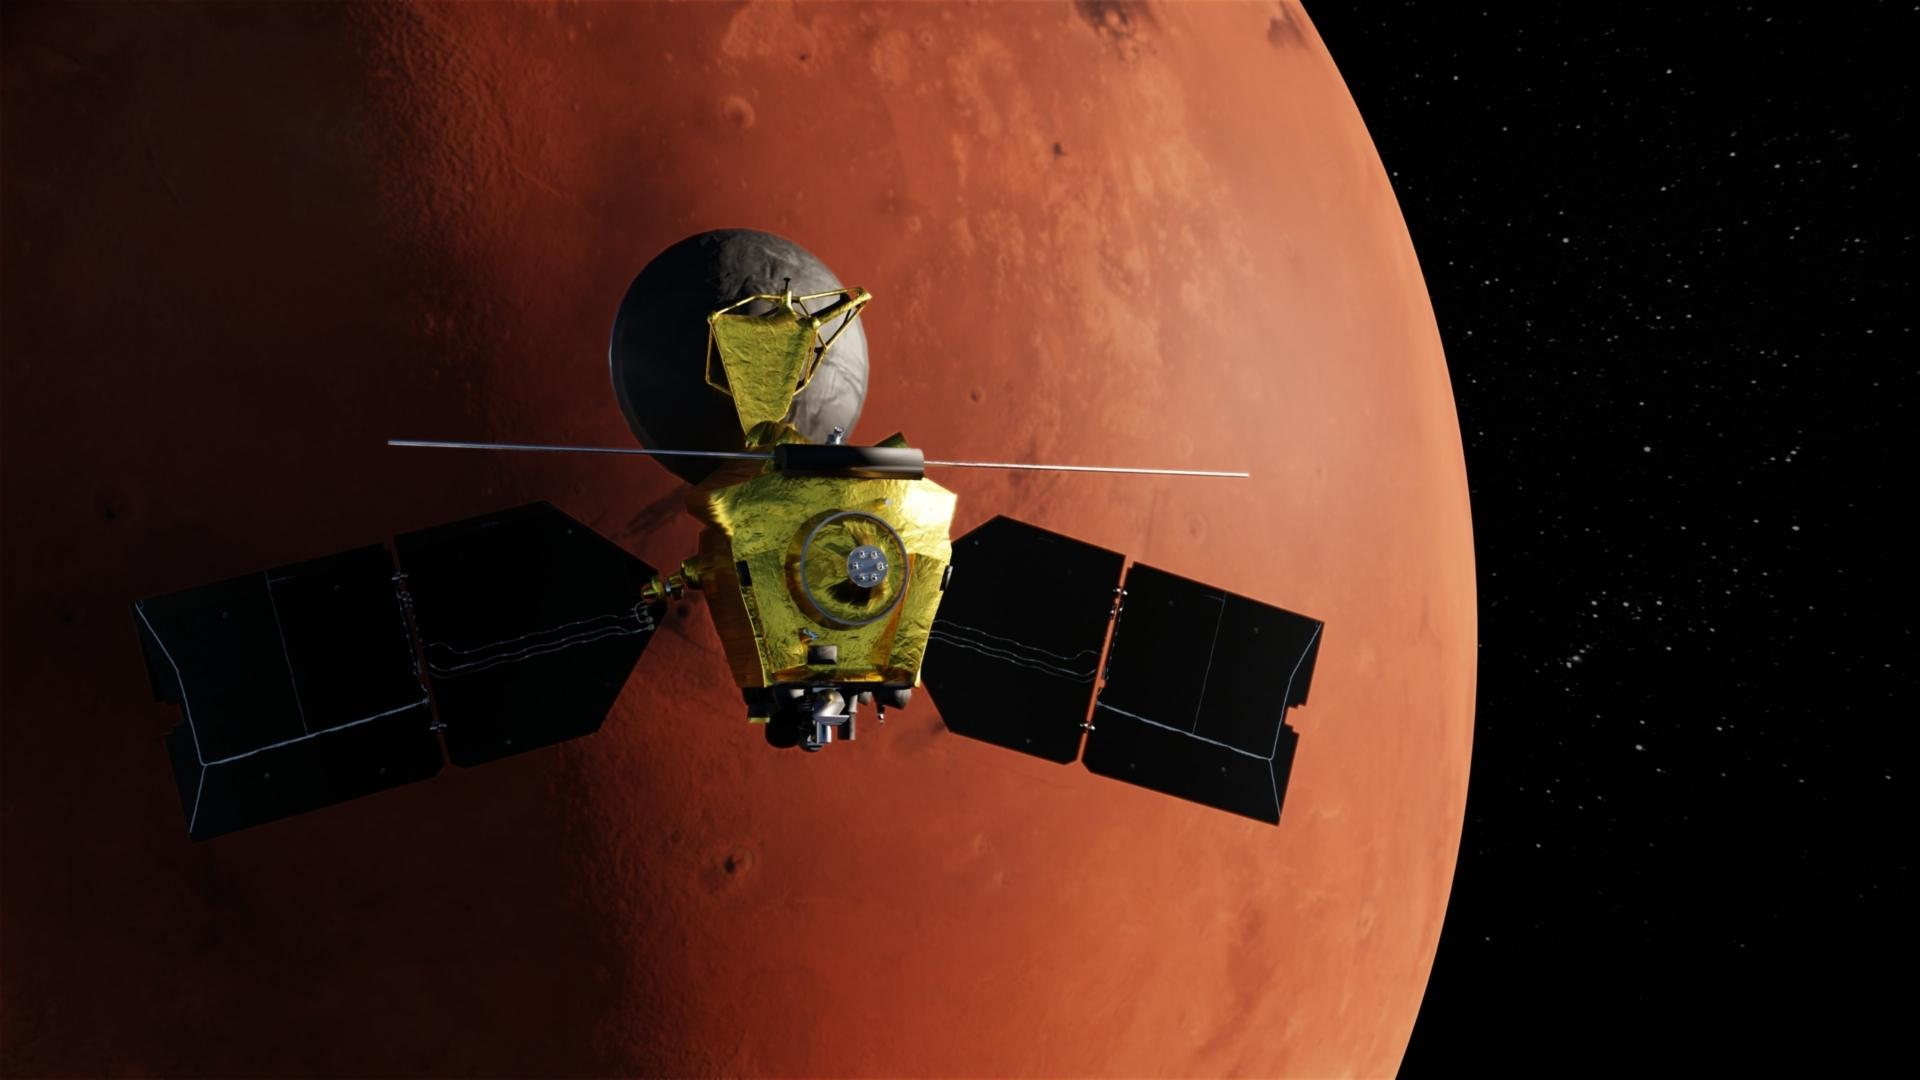 mro-mars-reconnaissance-orbiter